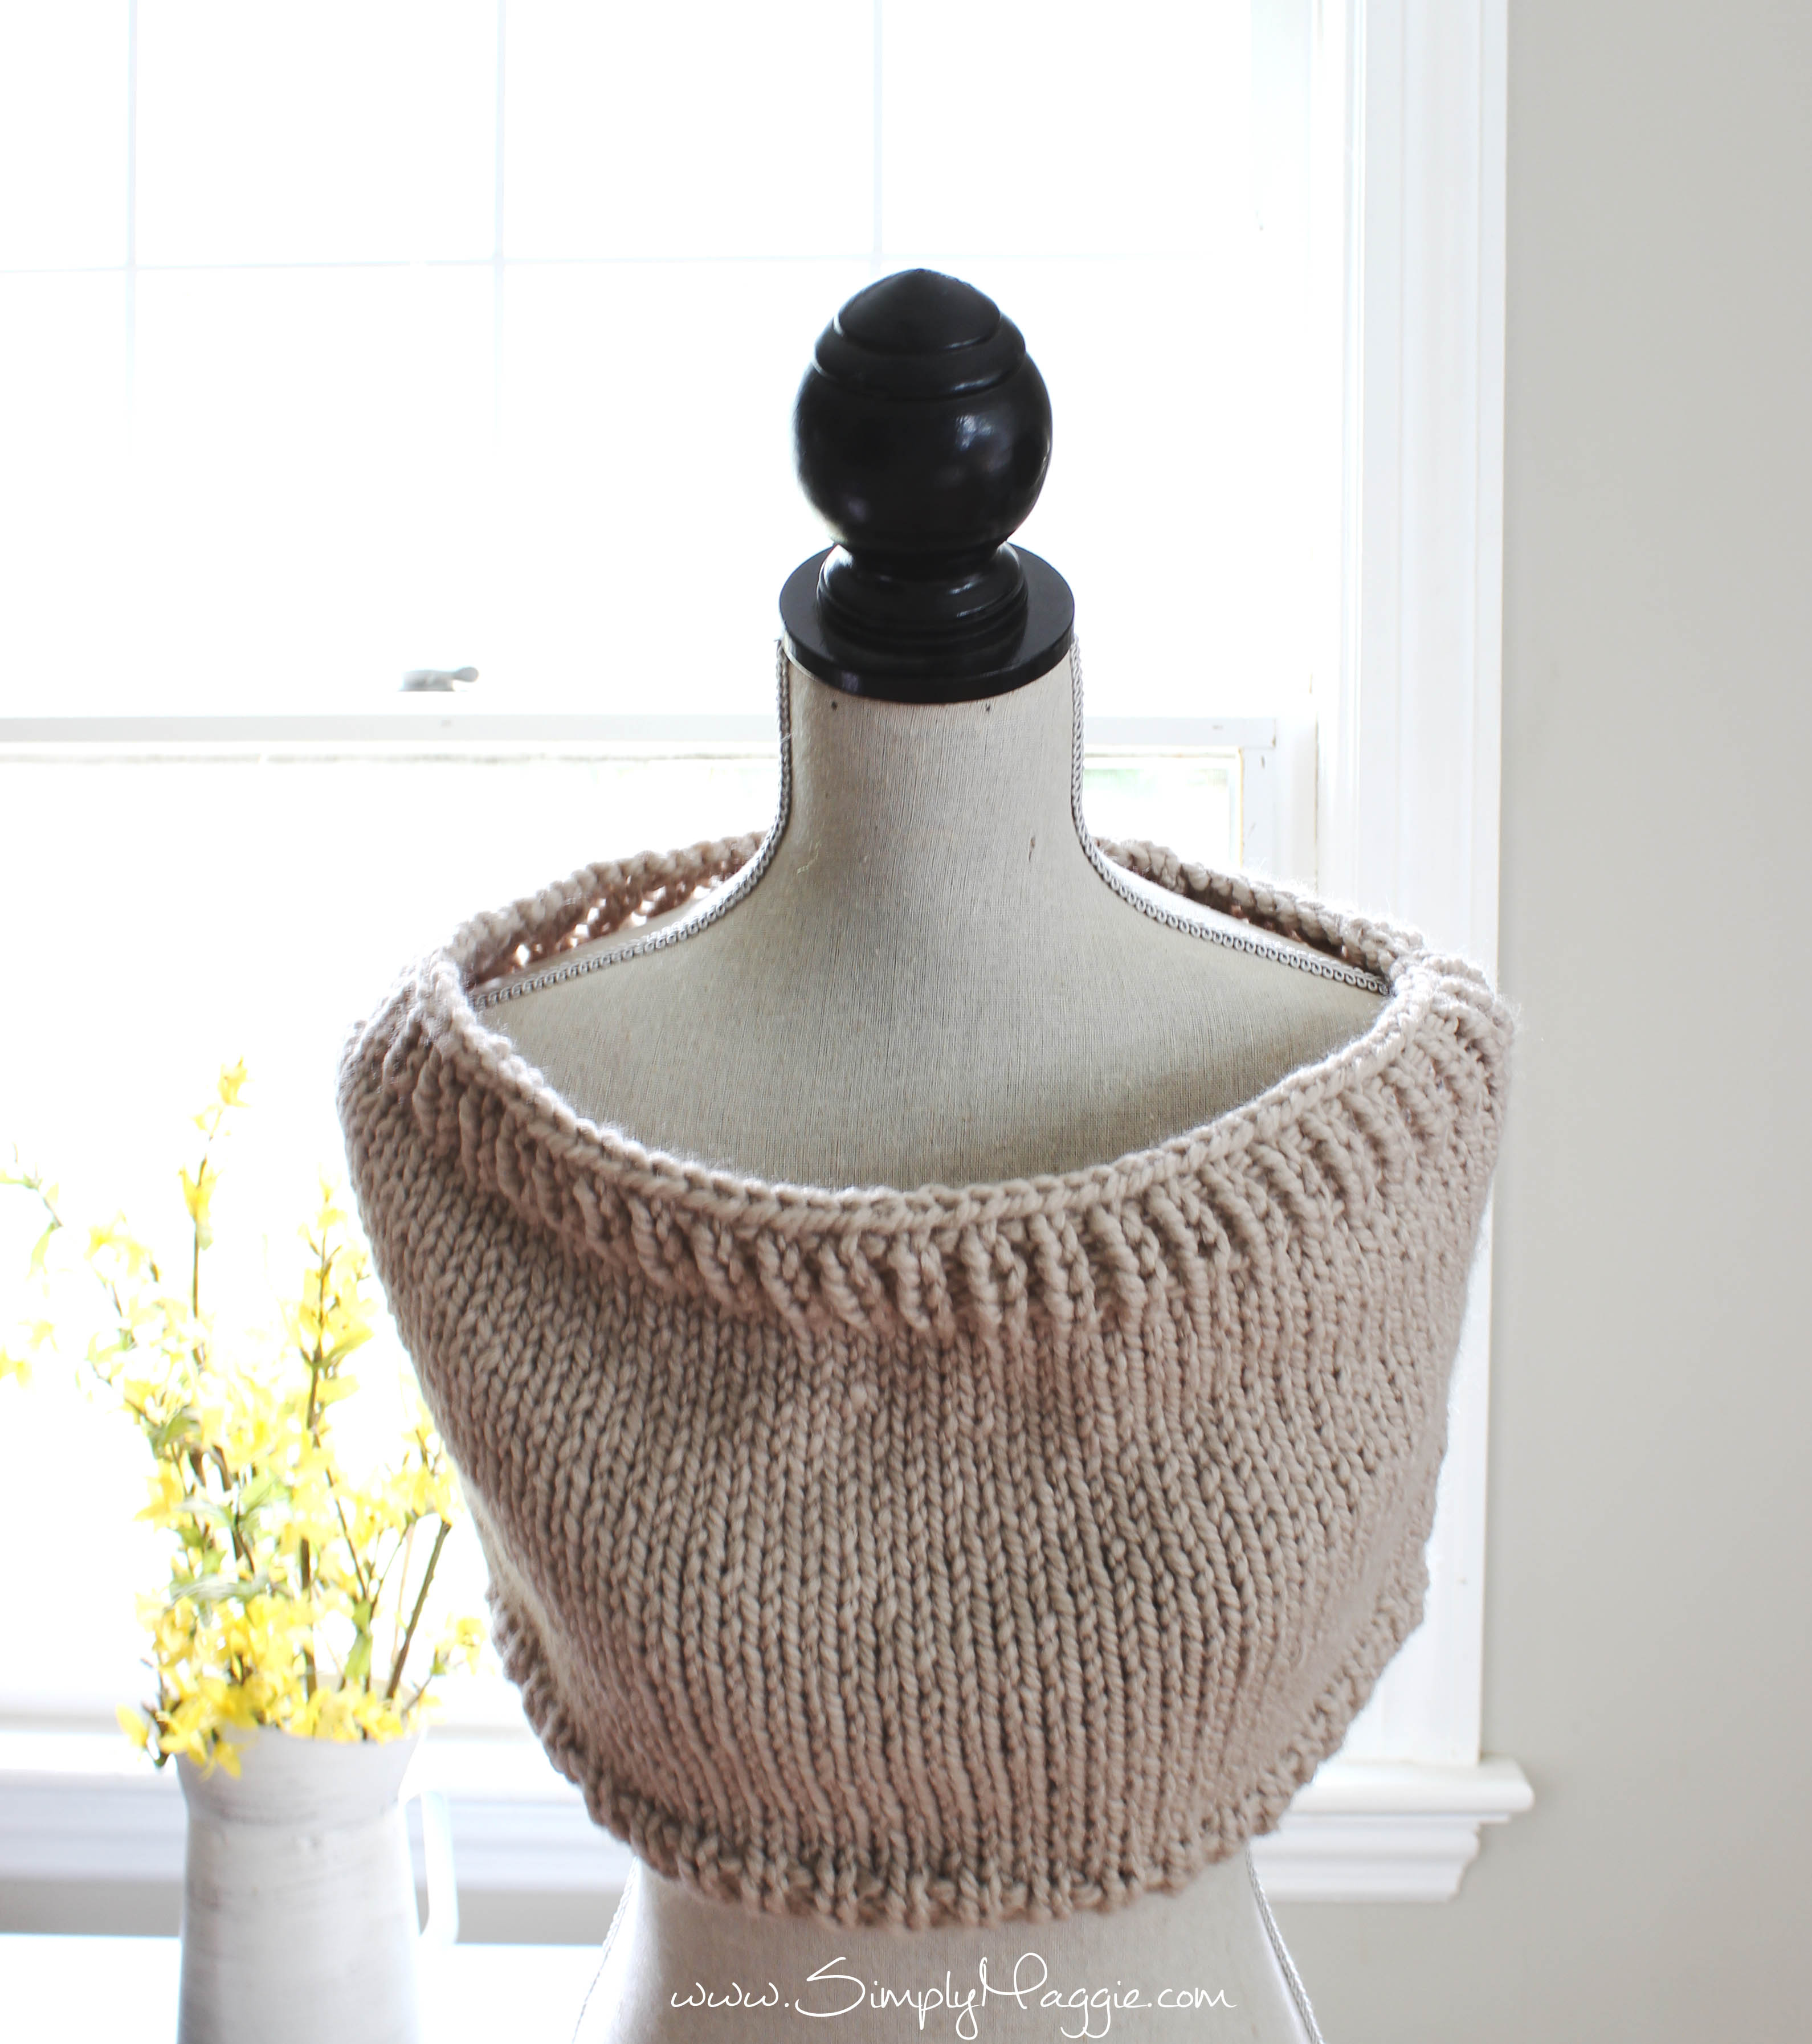 Chunky Knit Cowl Pattern Free : Chunky Tri-Style Knit Cowl Pattern (FREE!) SimplyMaggie.com